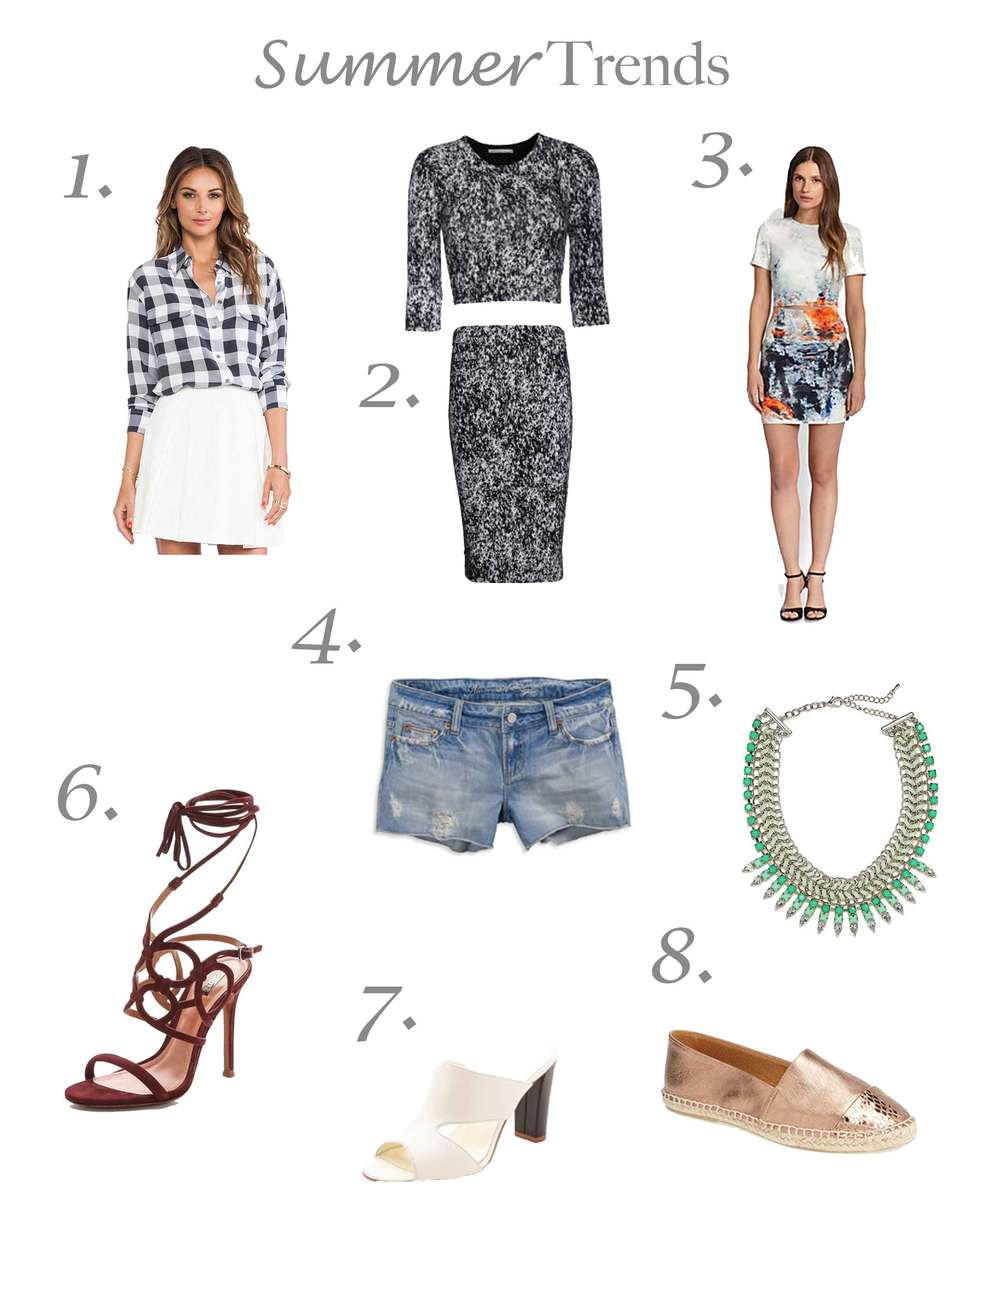 summer trends, equipment gingham blouse, mule, matching separates, Bec and Bridge, Bauble Bar, statement necklaces, denim cutoffs, gap, strappy stilettos, topshop